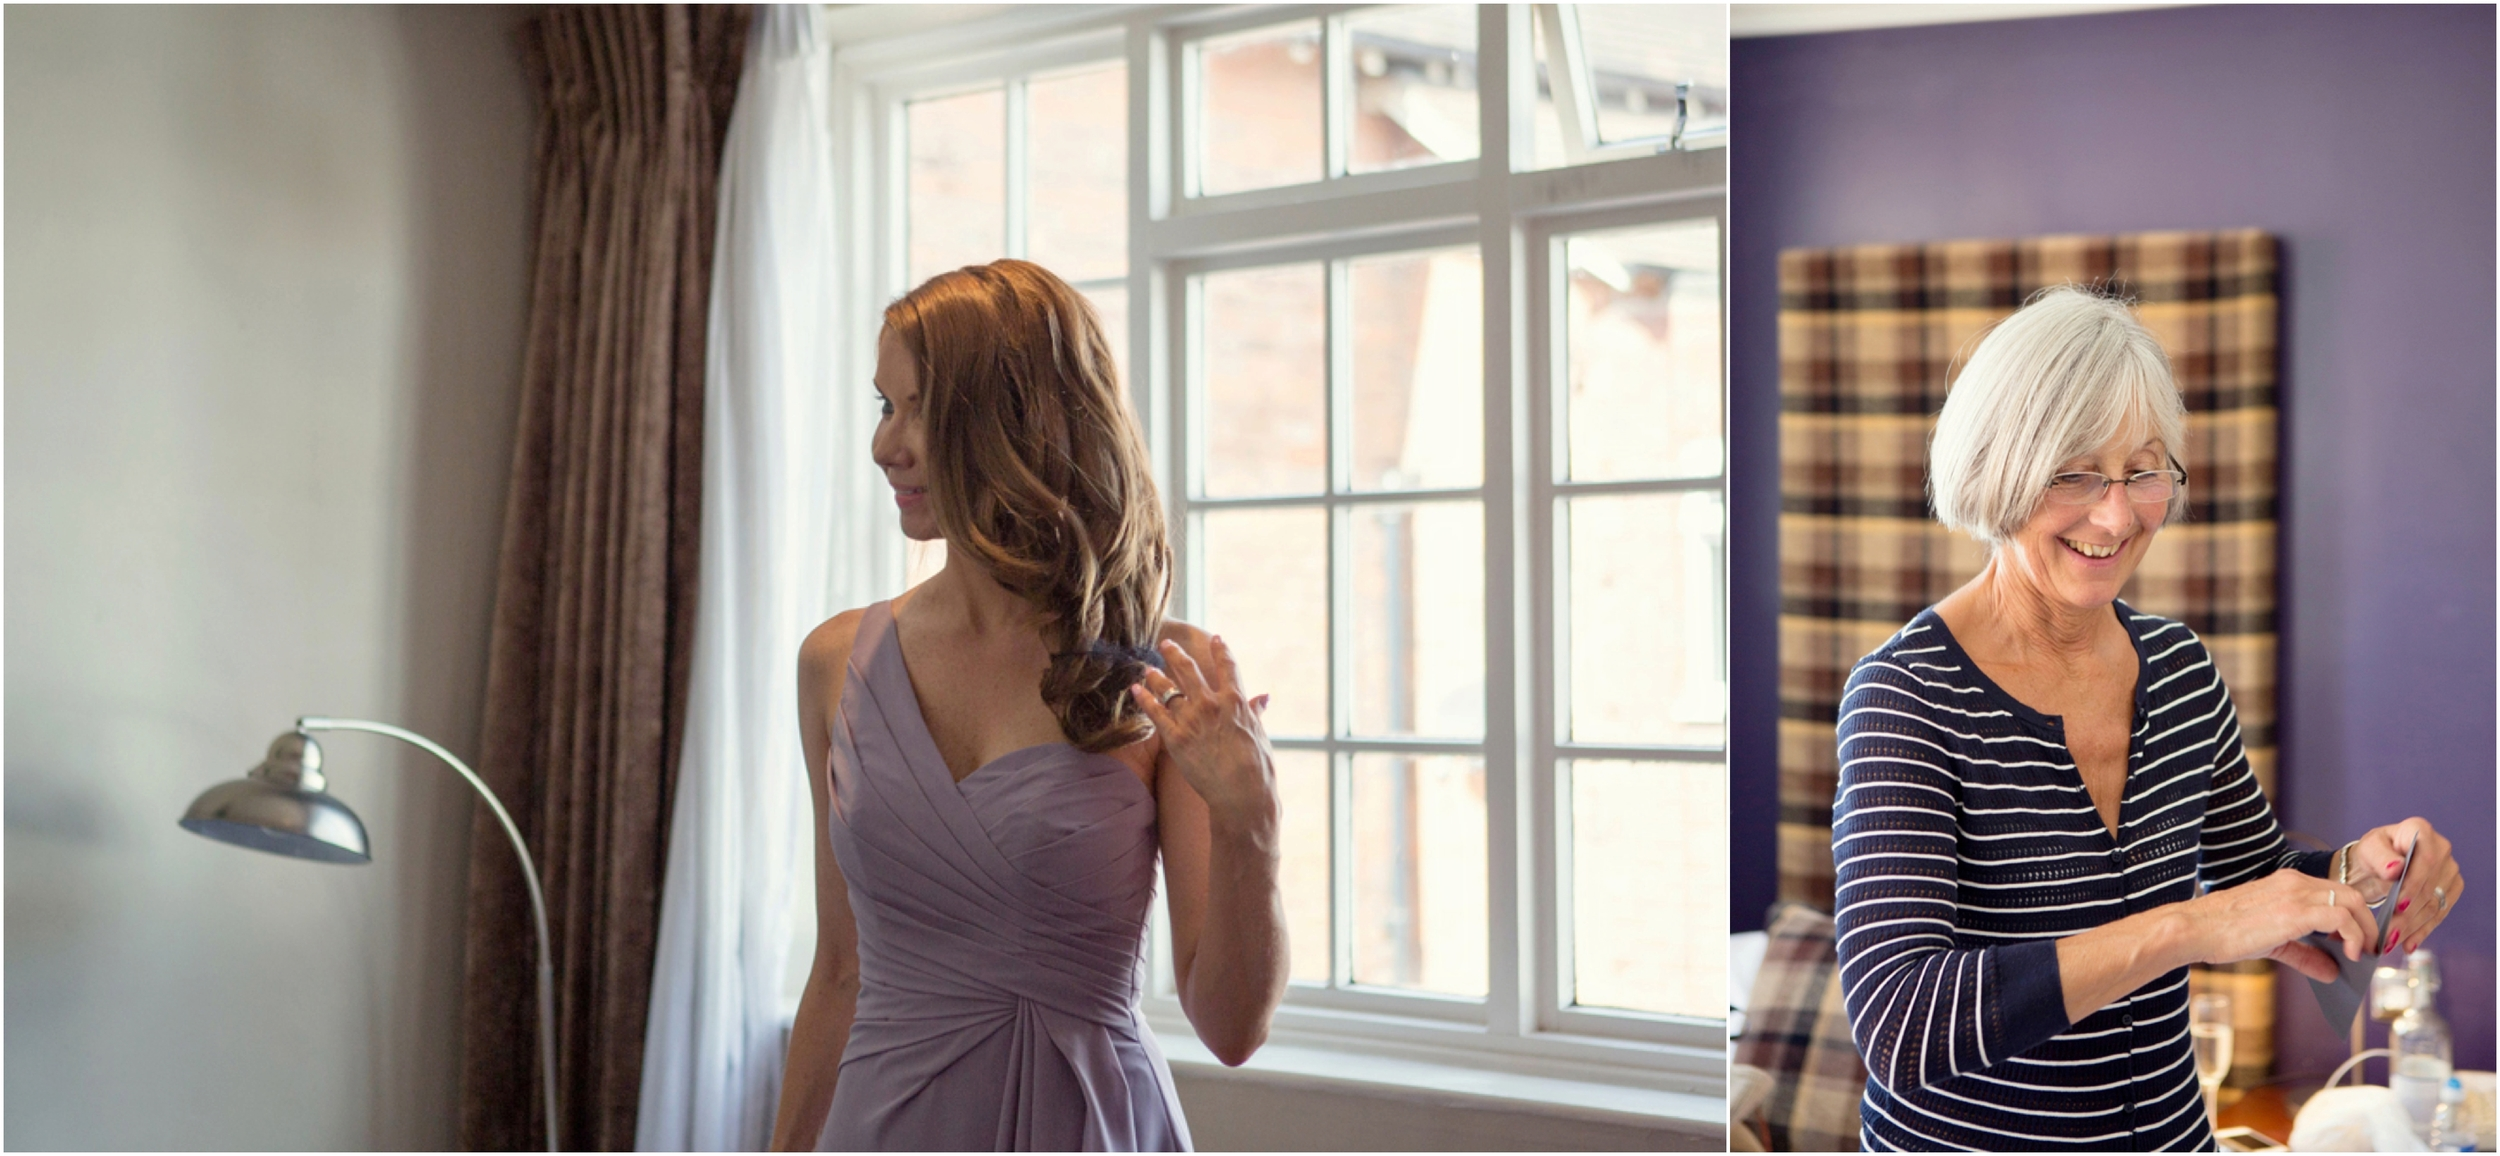 Sophie Evans Photography, Warwickshire Wedding Photography, Welcombe Hotel  (10).jpg